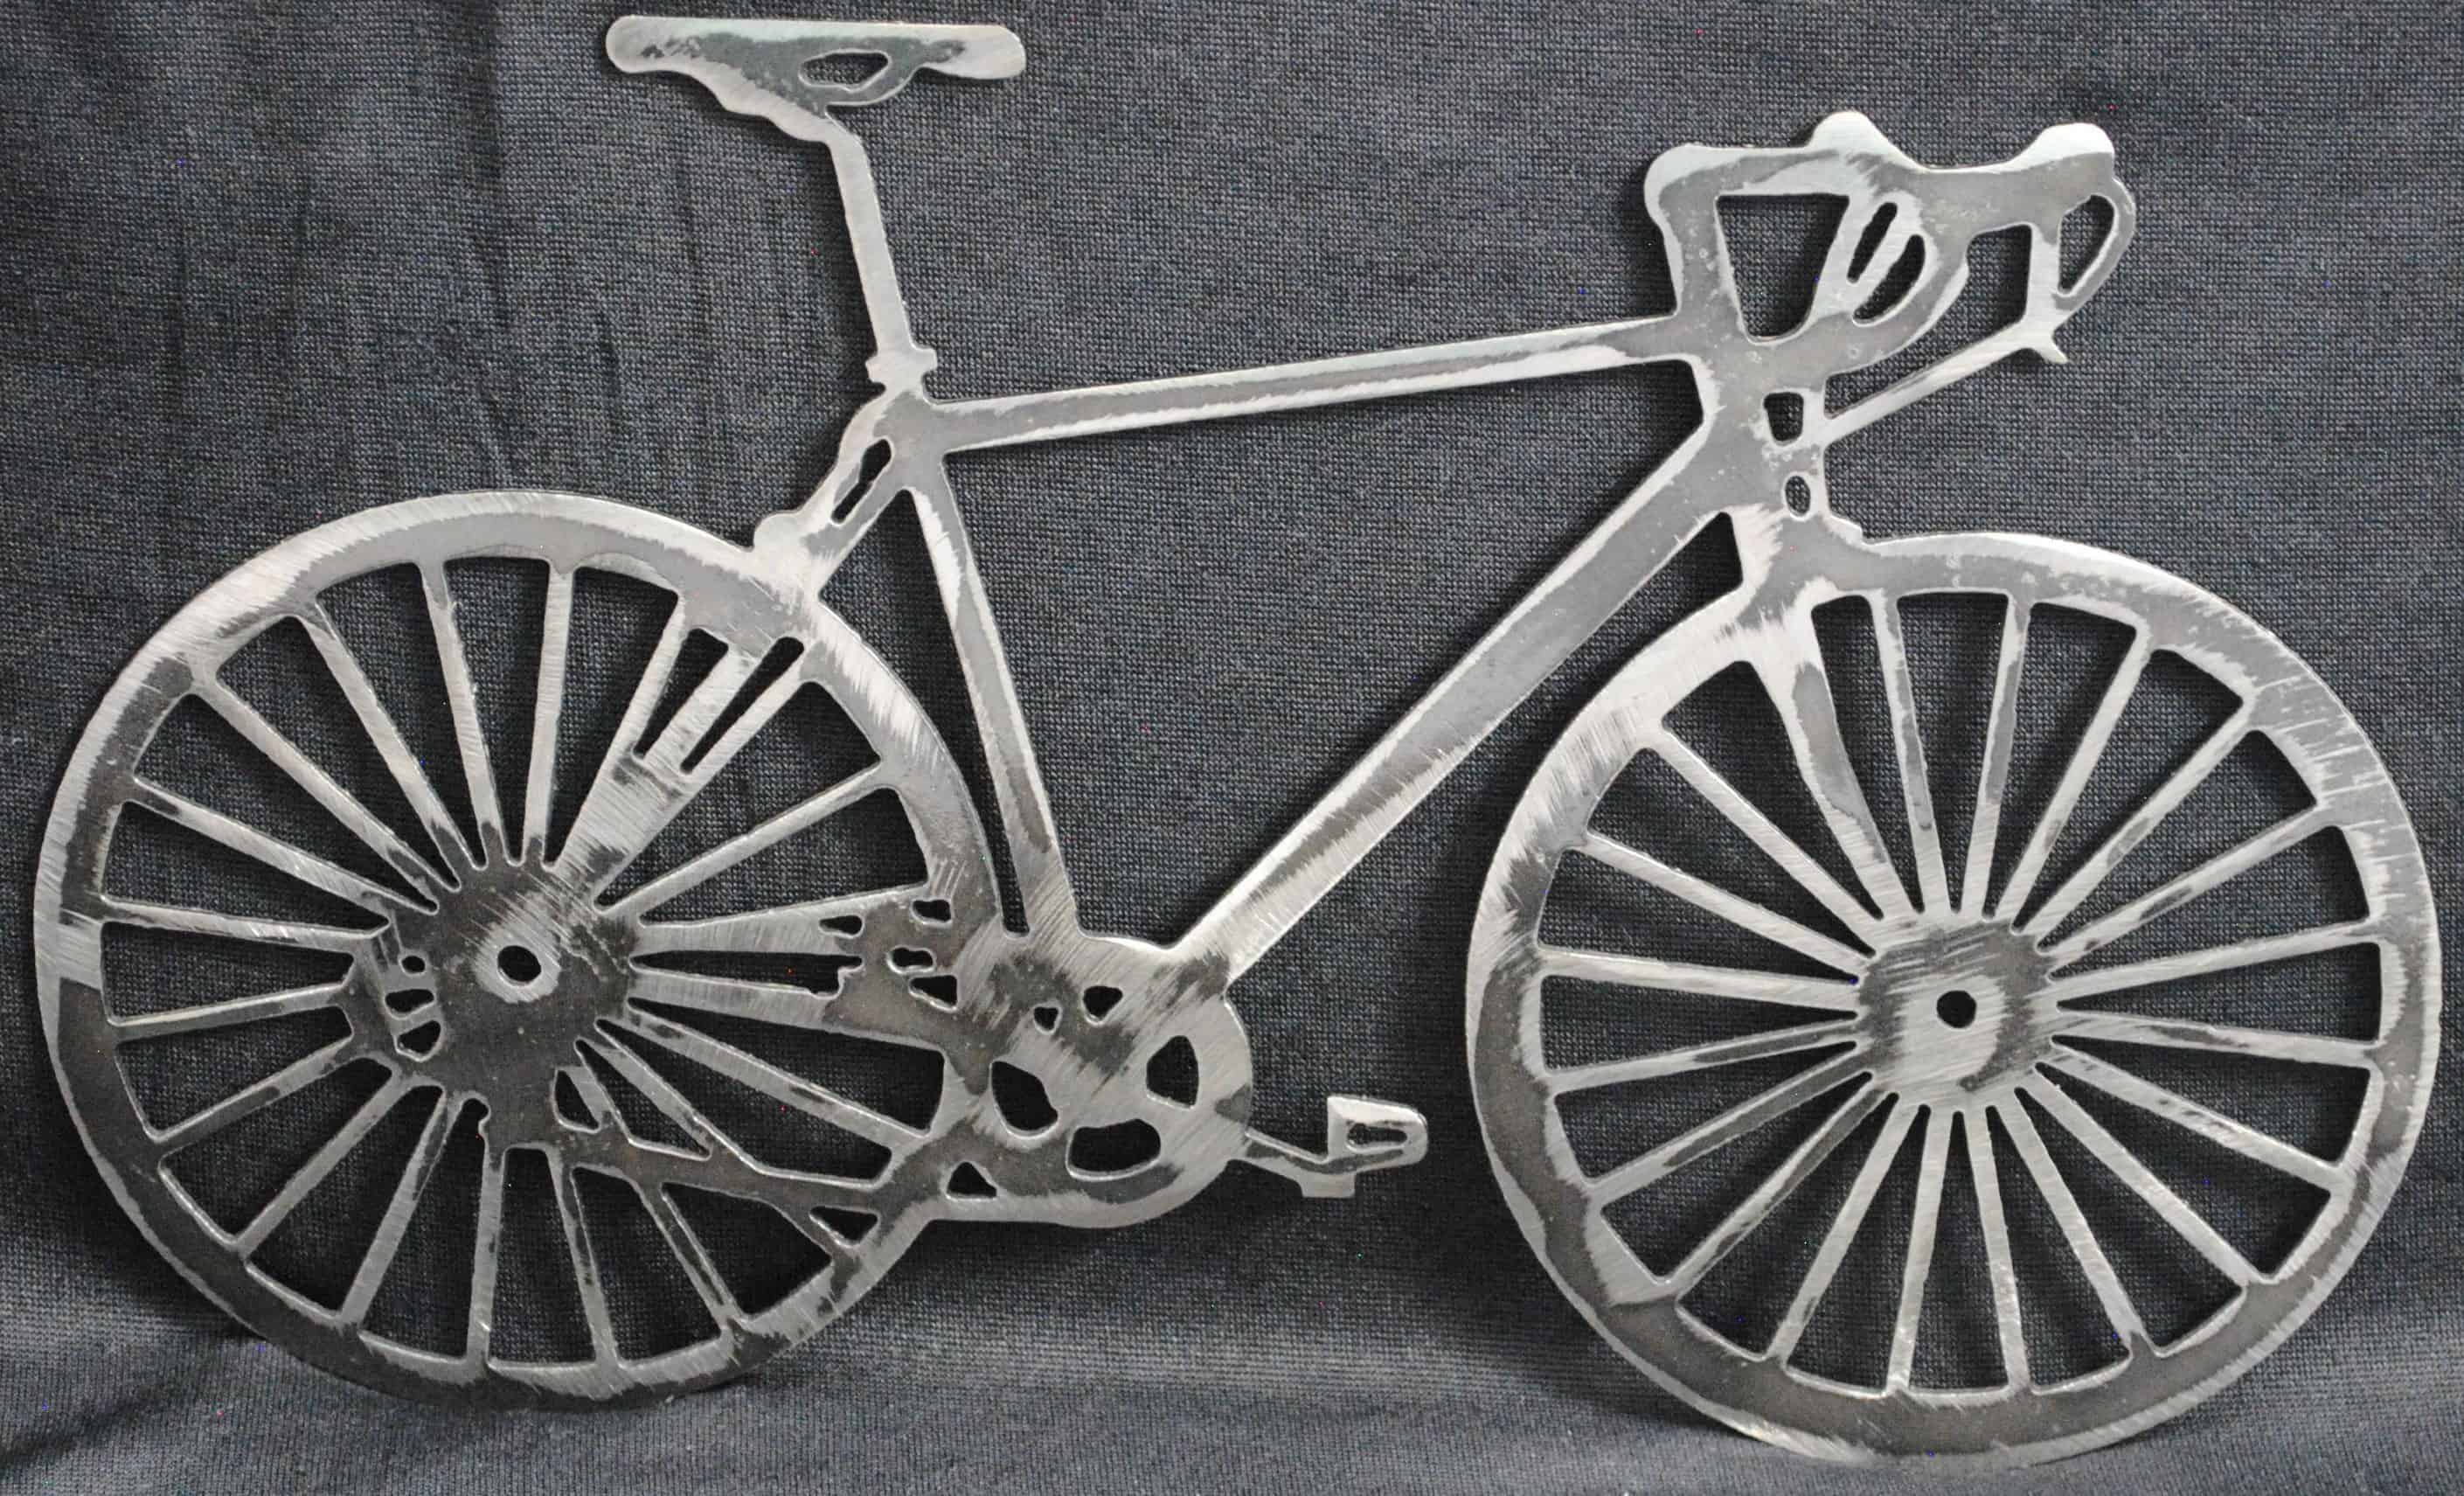 Metal Bicycle Wall Art – Metal Art Colorado In Favorite Metal Bicycle Wall Decor (View 14 of 20)